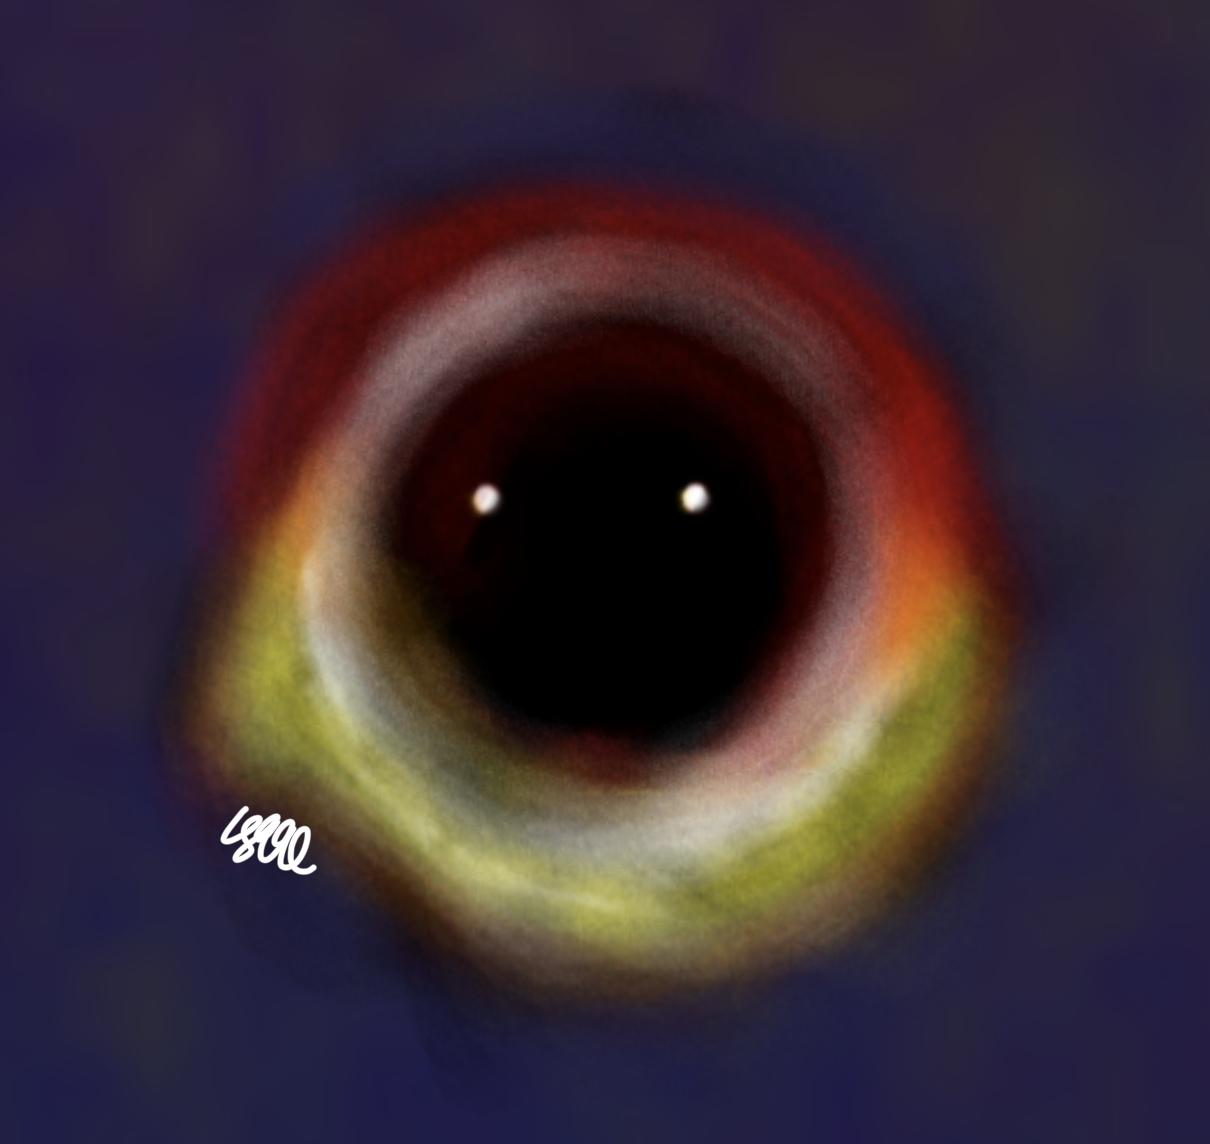 M87 Supermassive Black holeball